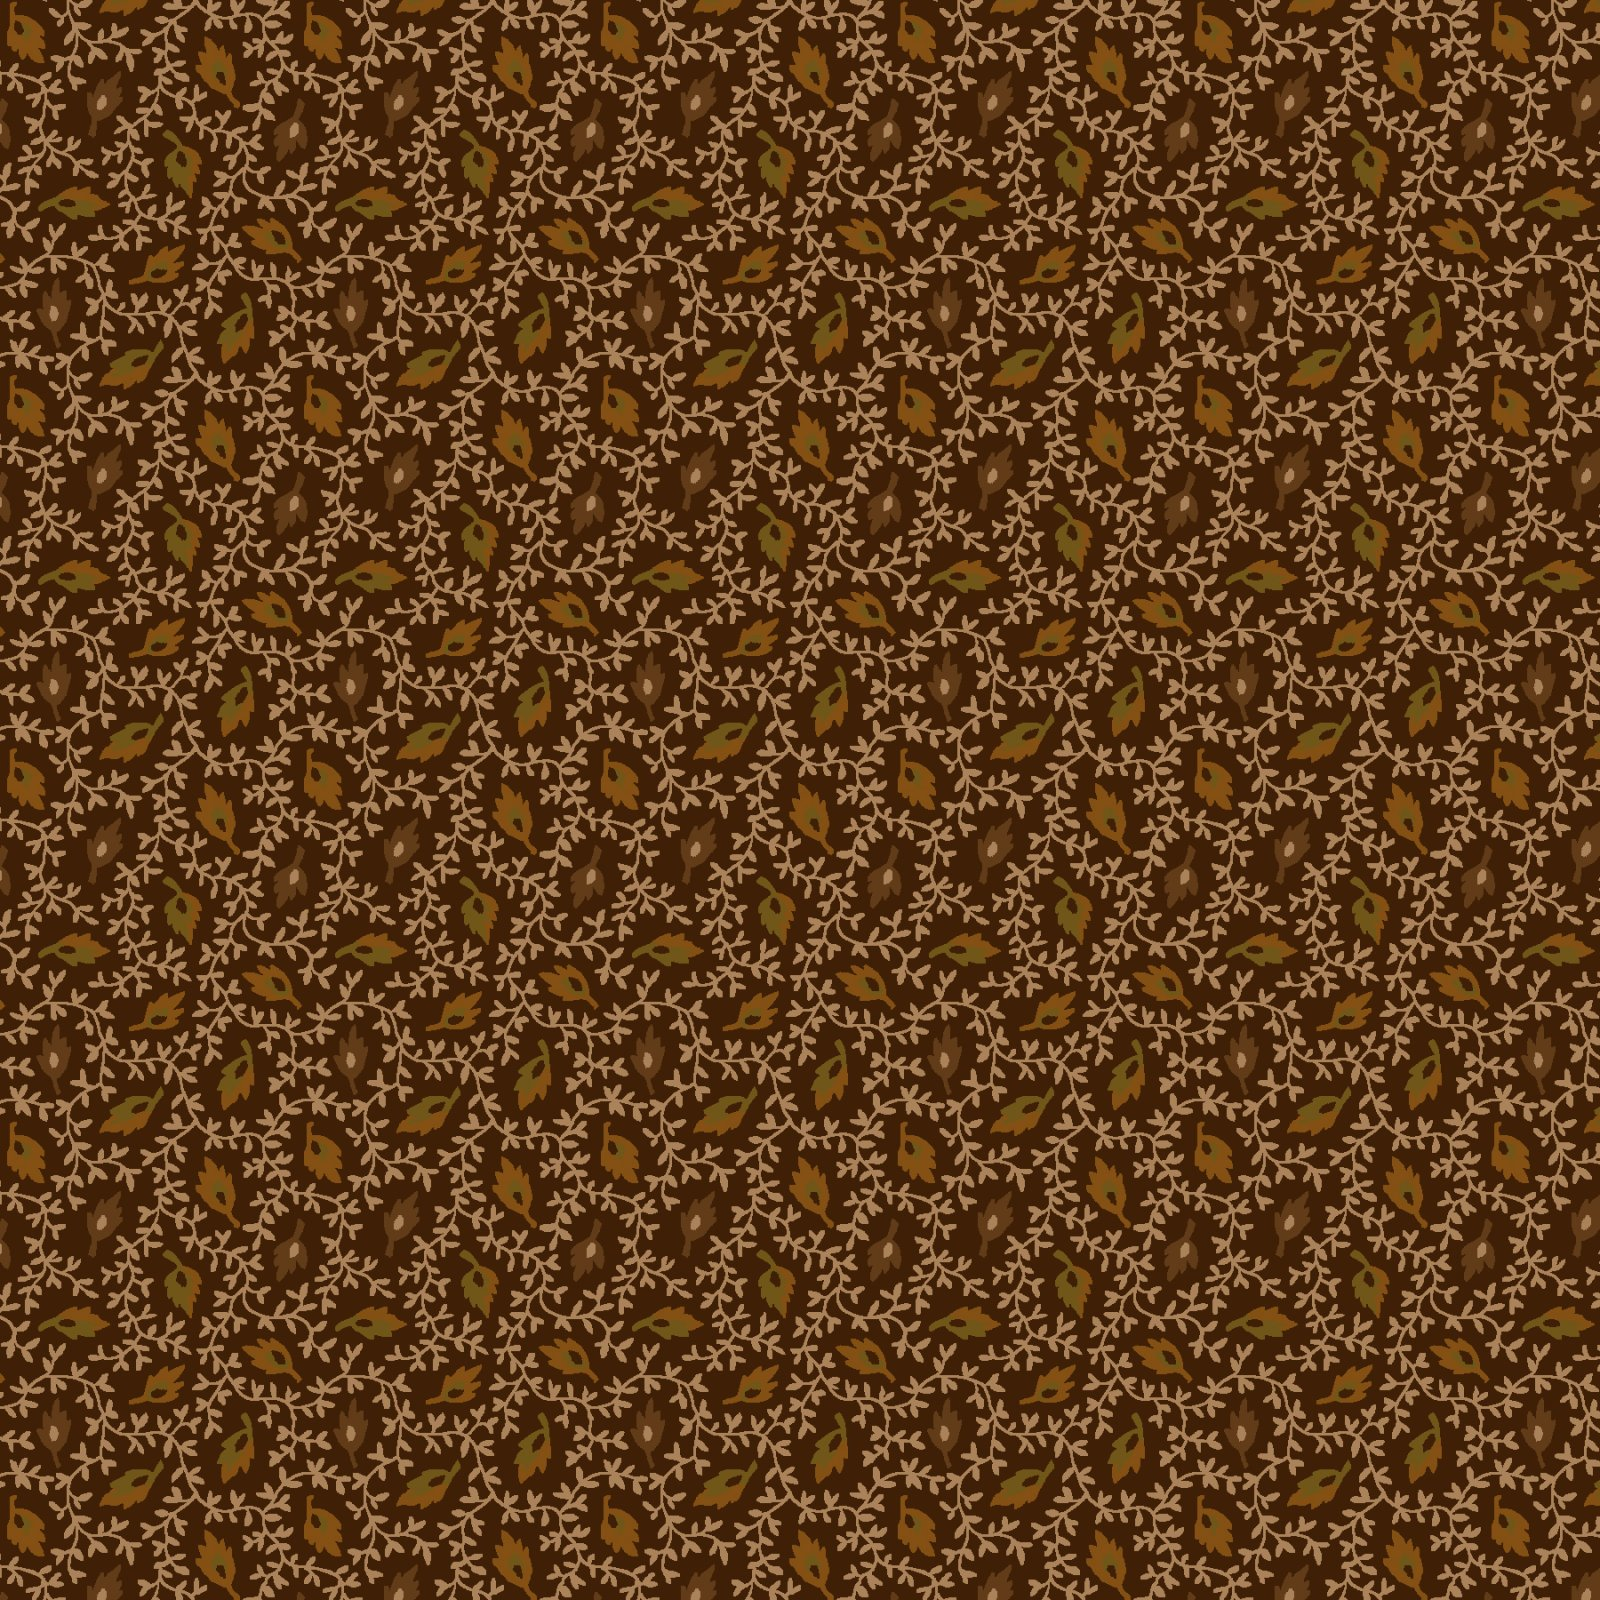 Buttermilk Autumn - 2279-38 * 1/2 yard